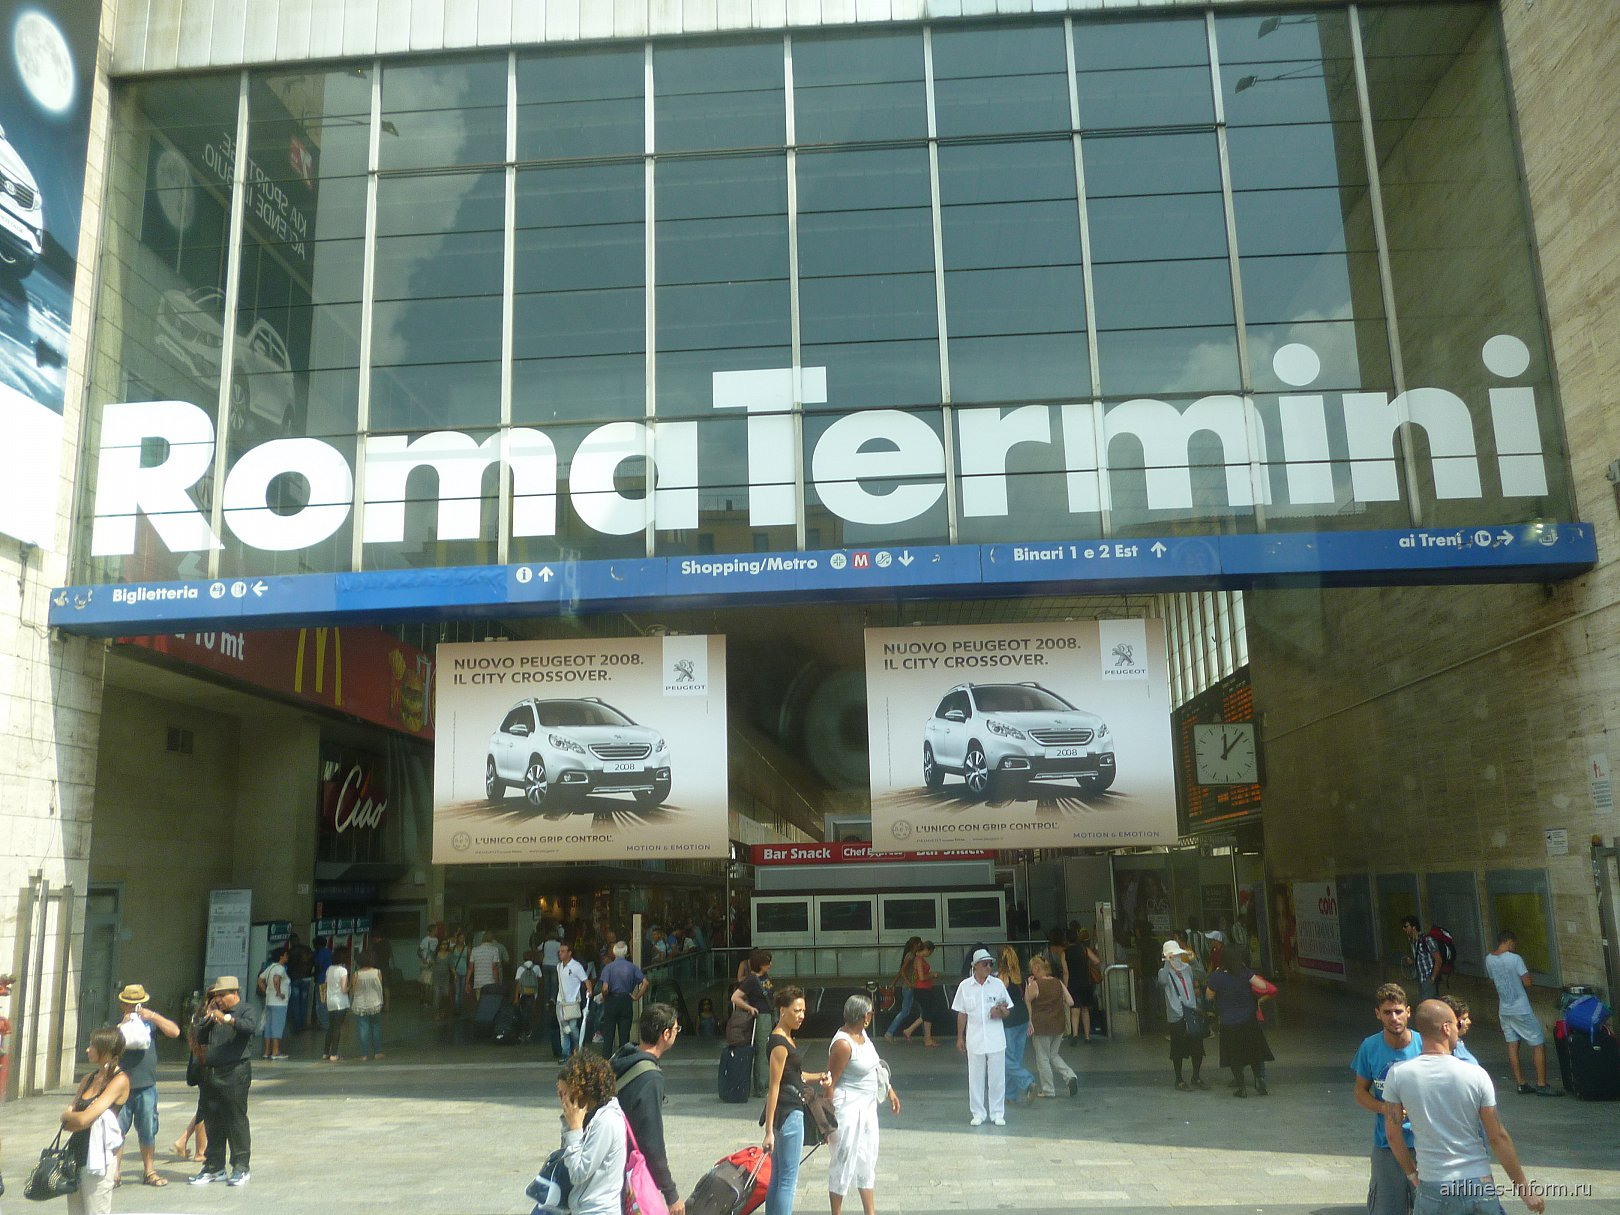 Roma-Terminia